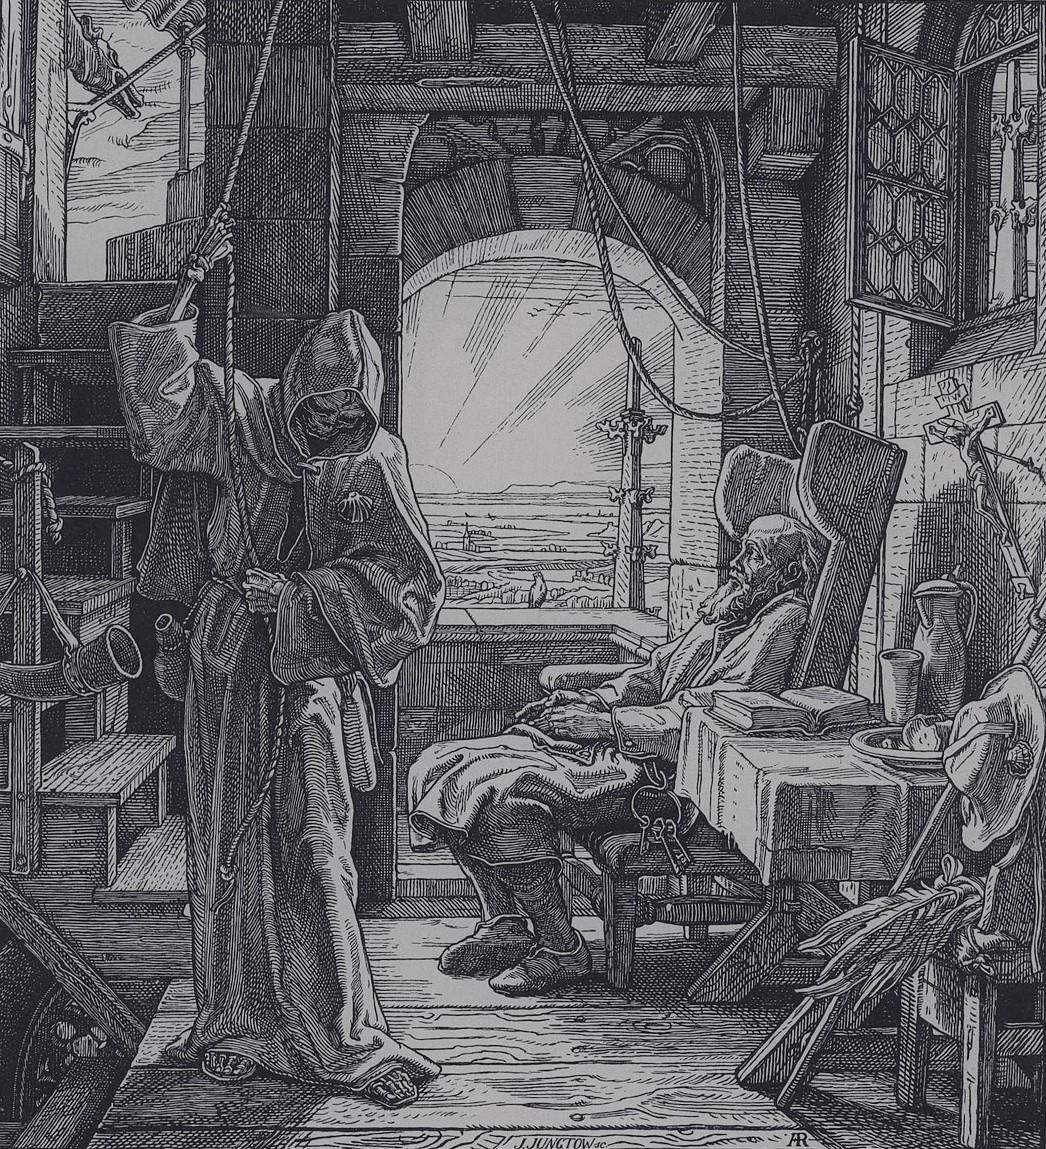 Alfred_Rethel 1851 La Mort comme Amie Tod als Freund